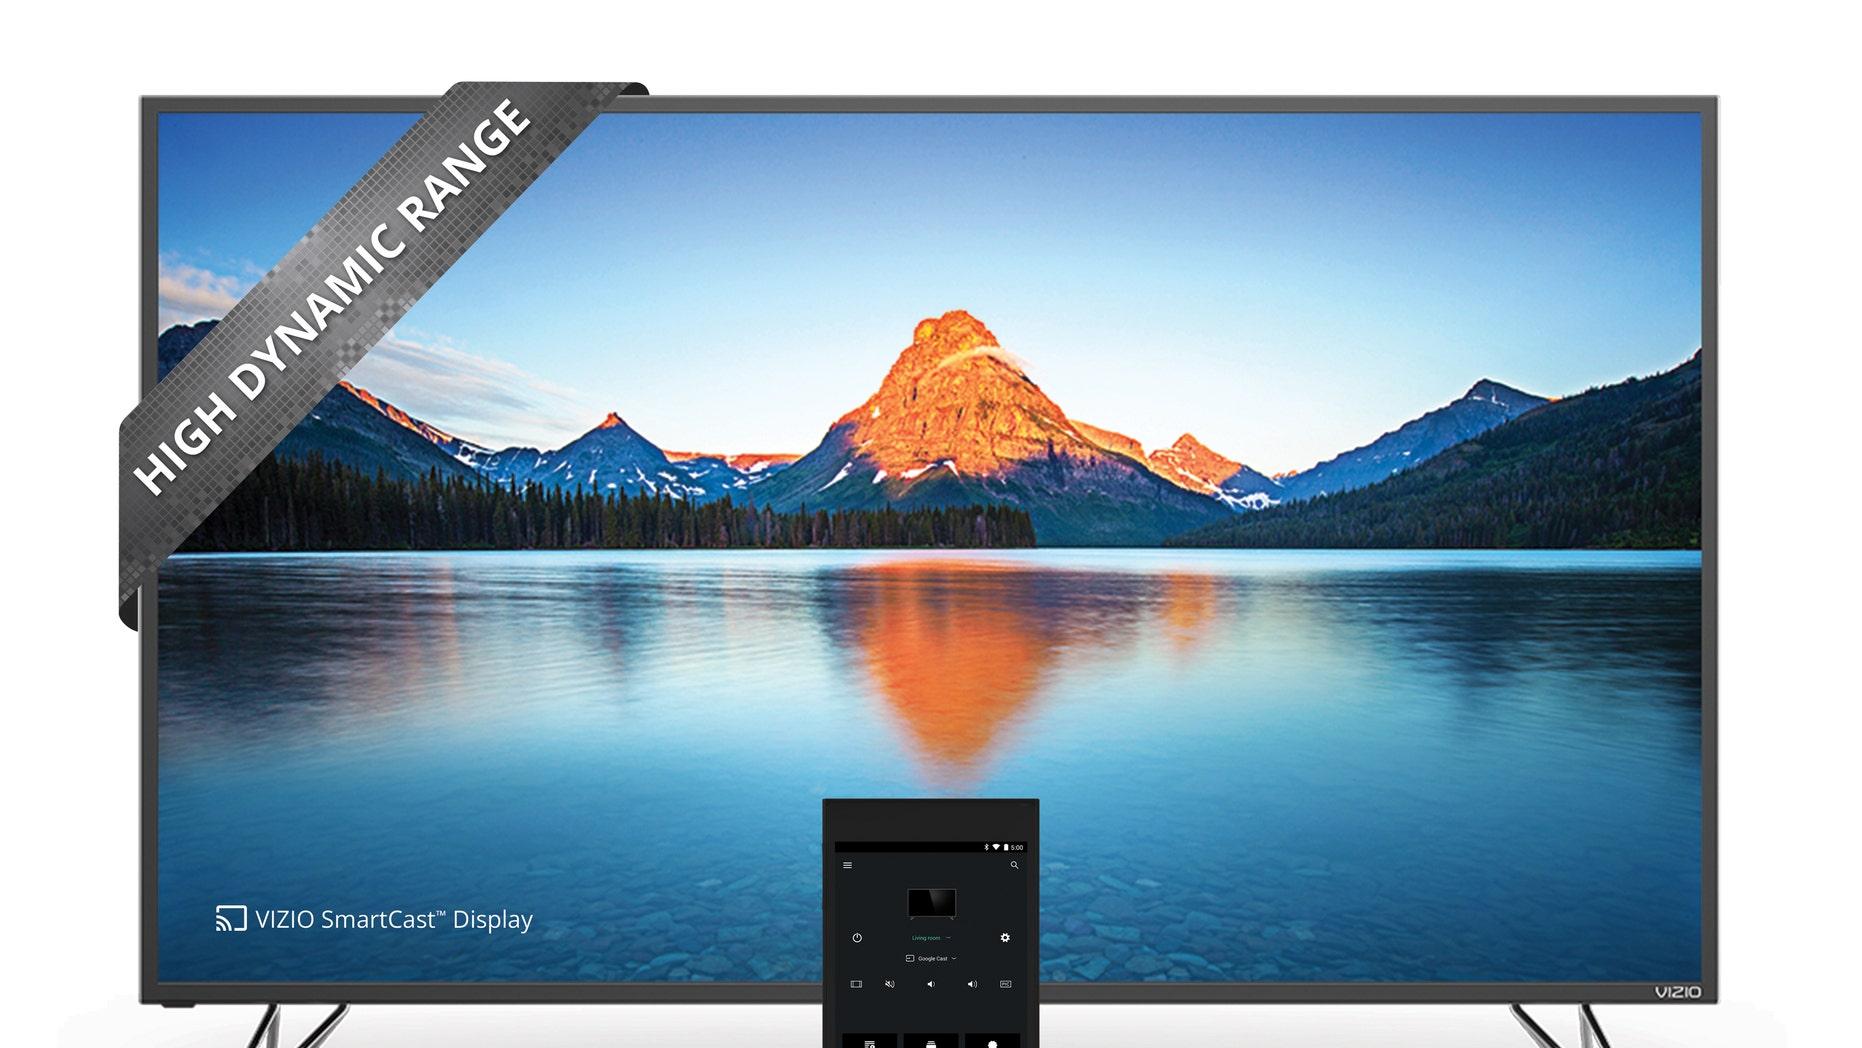 VIZIO SmartCast M-Series Ultra HD HDR Home Theater Display and tablet remote. (VIZIO, Inc.)